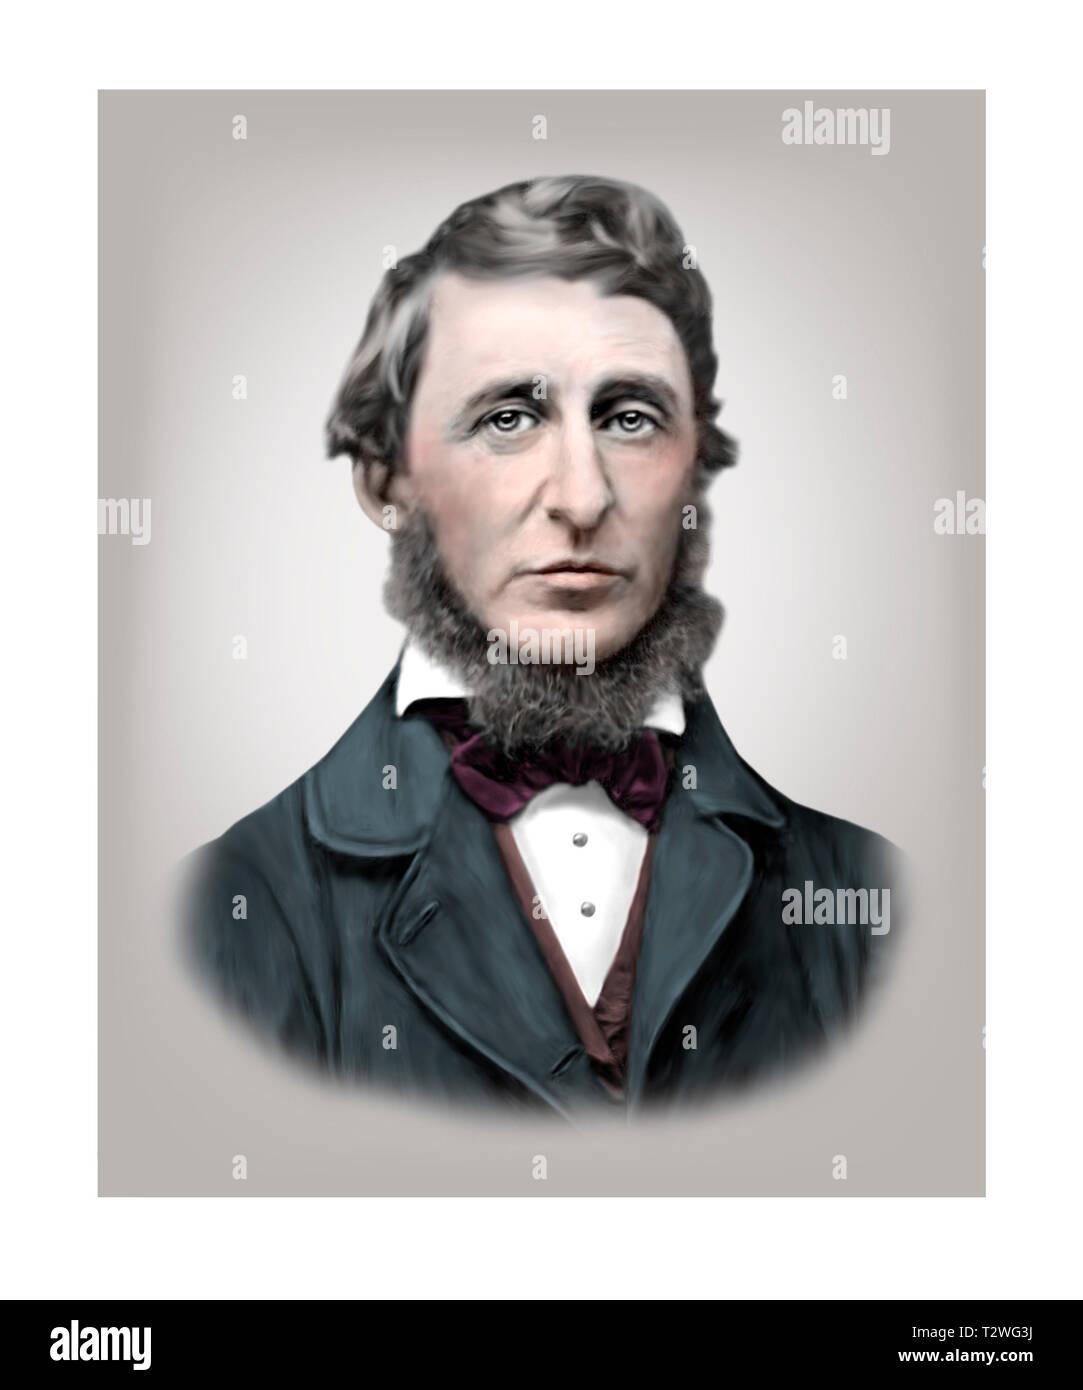 Henry David Thoreau 1817-1862 American Essayist Poet Philosopher - Stock Image